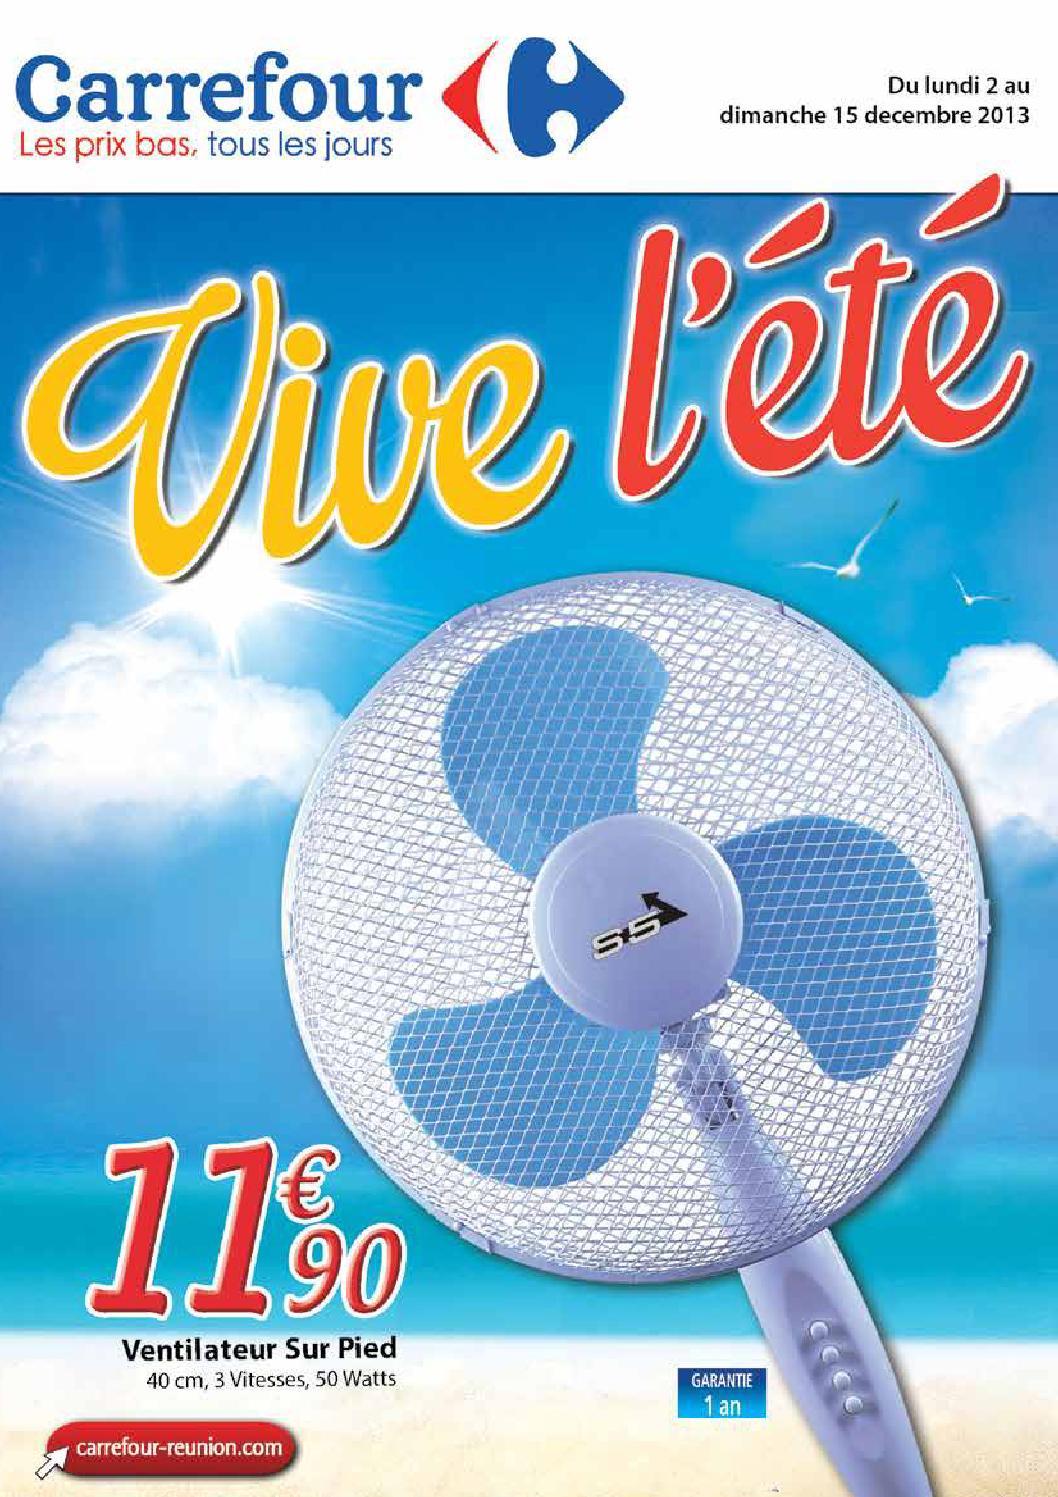 Viveete32A4 By Carrefour - Issuu pour Dalle Mousse Piscine Carrefour